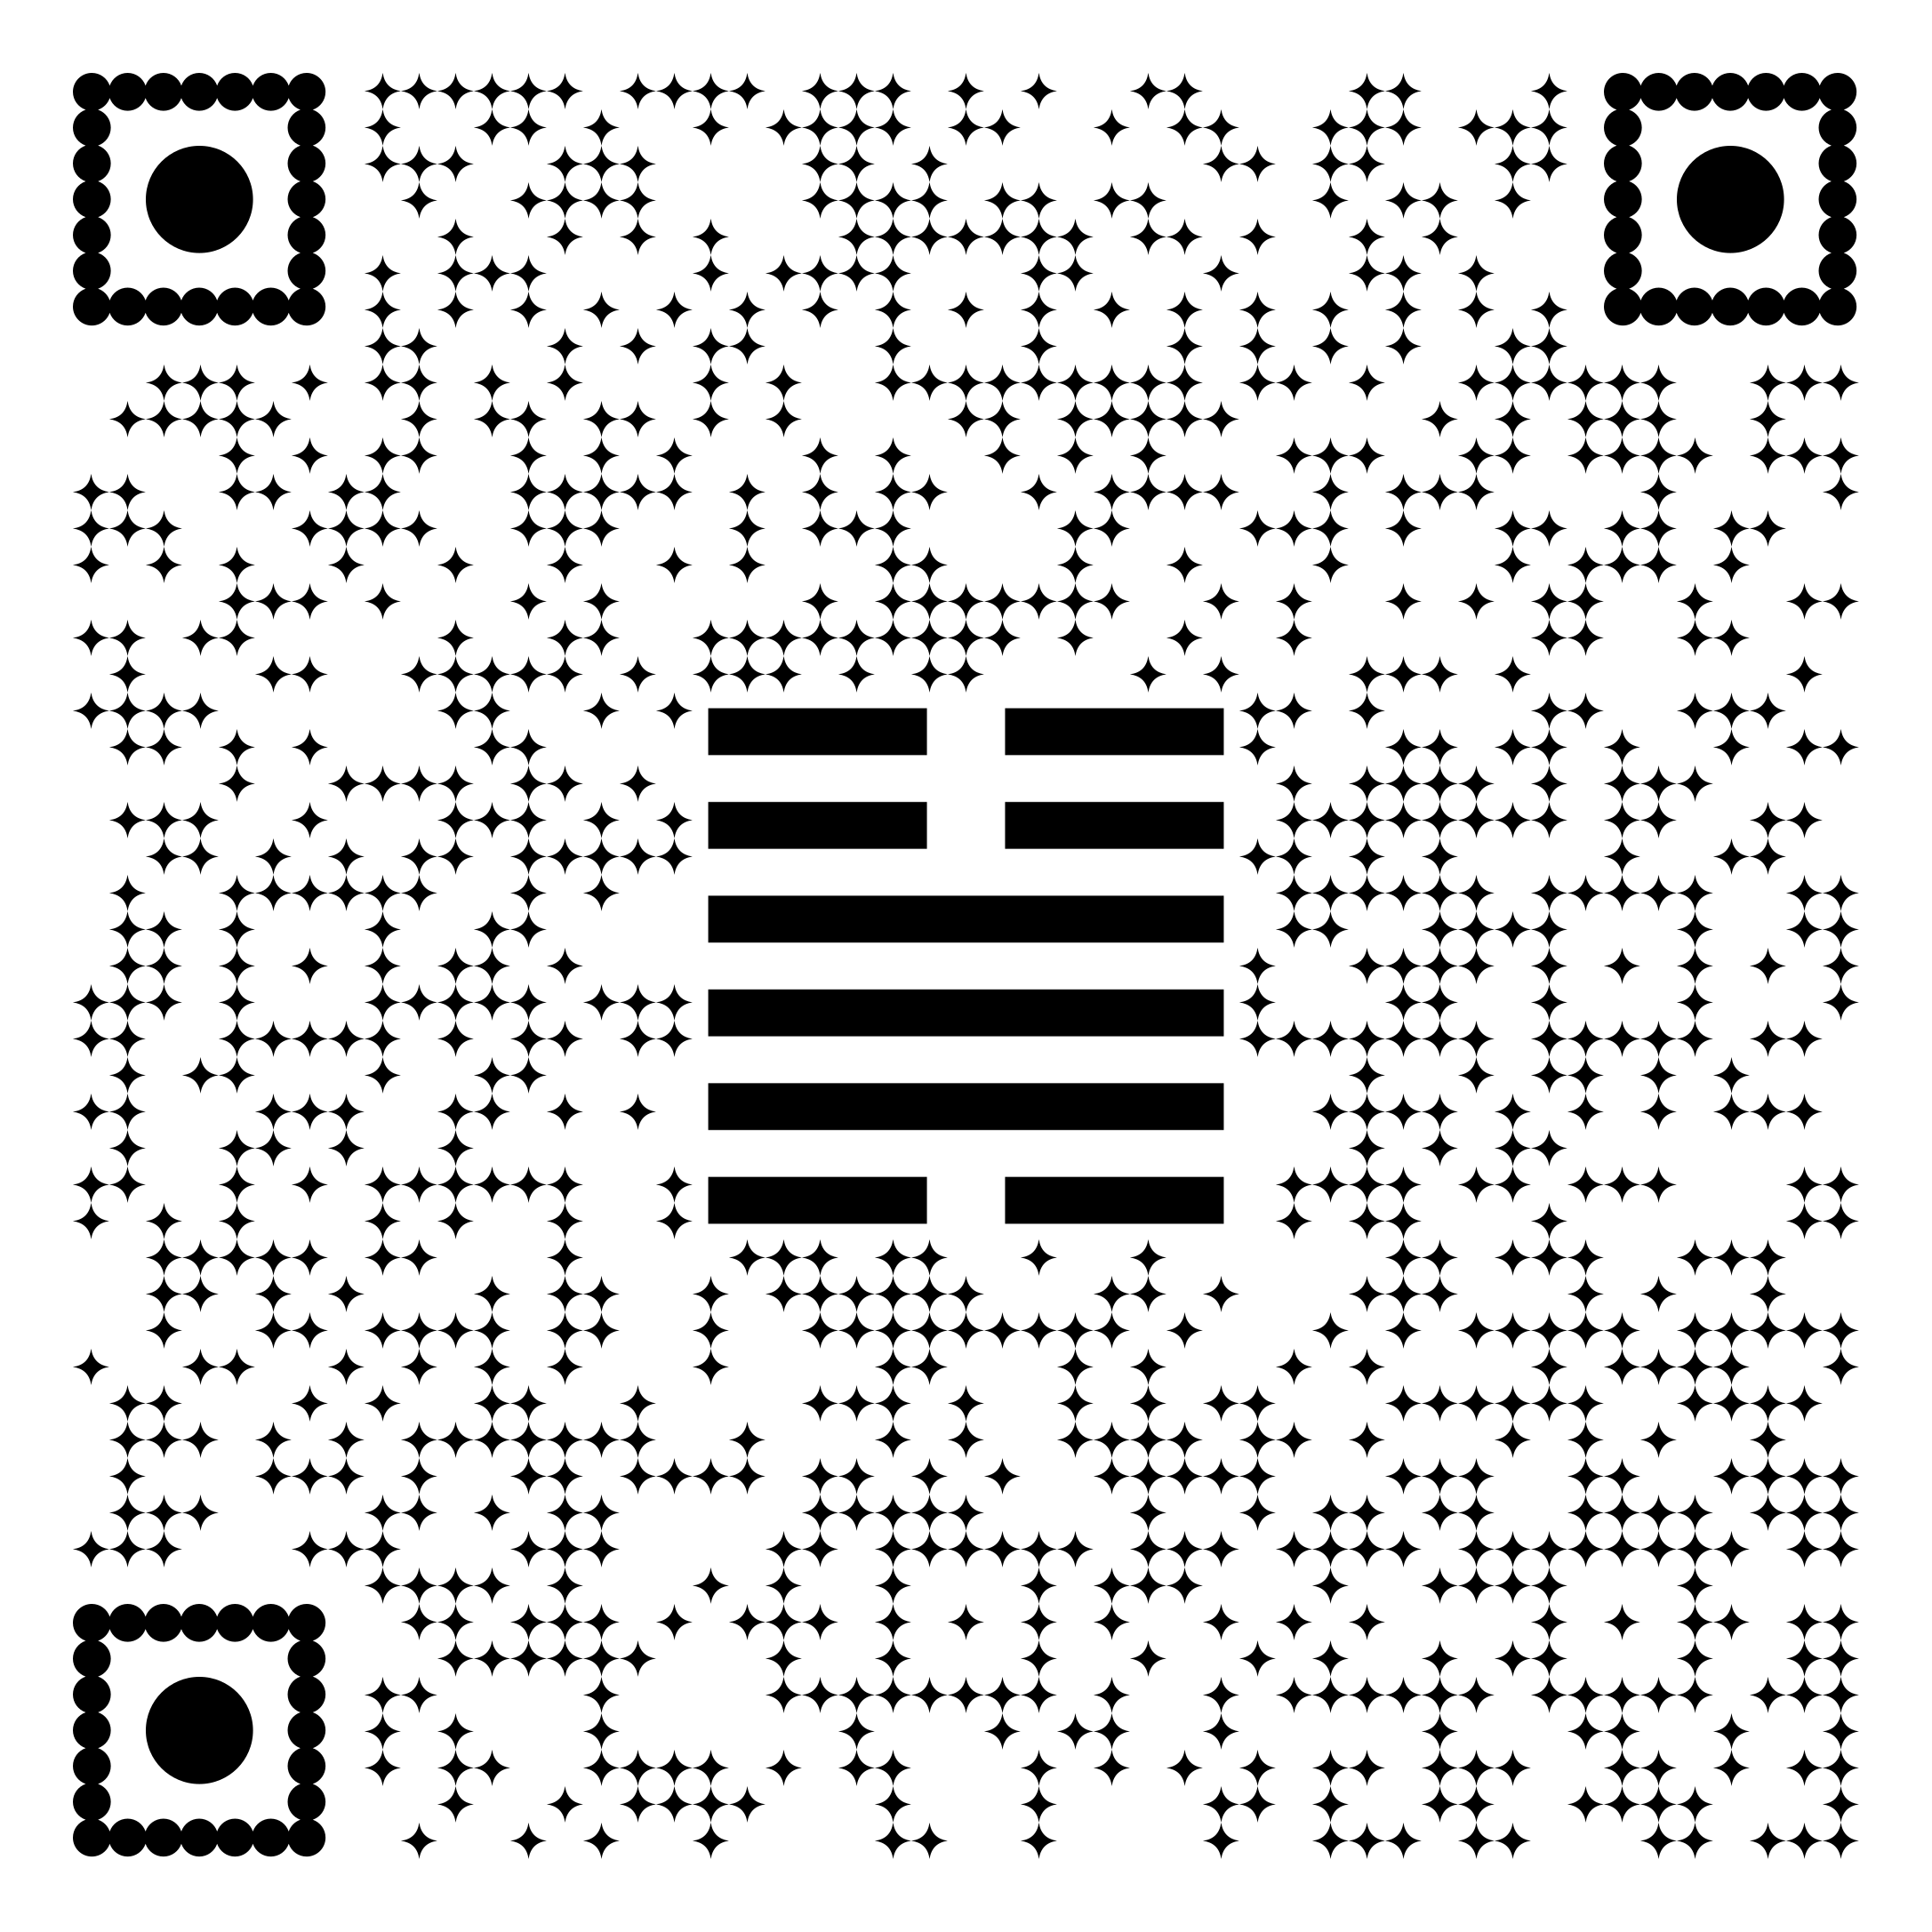 qr-code-32.png